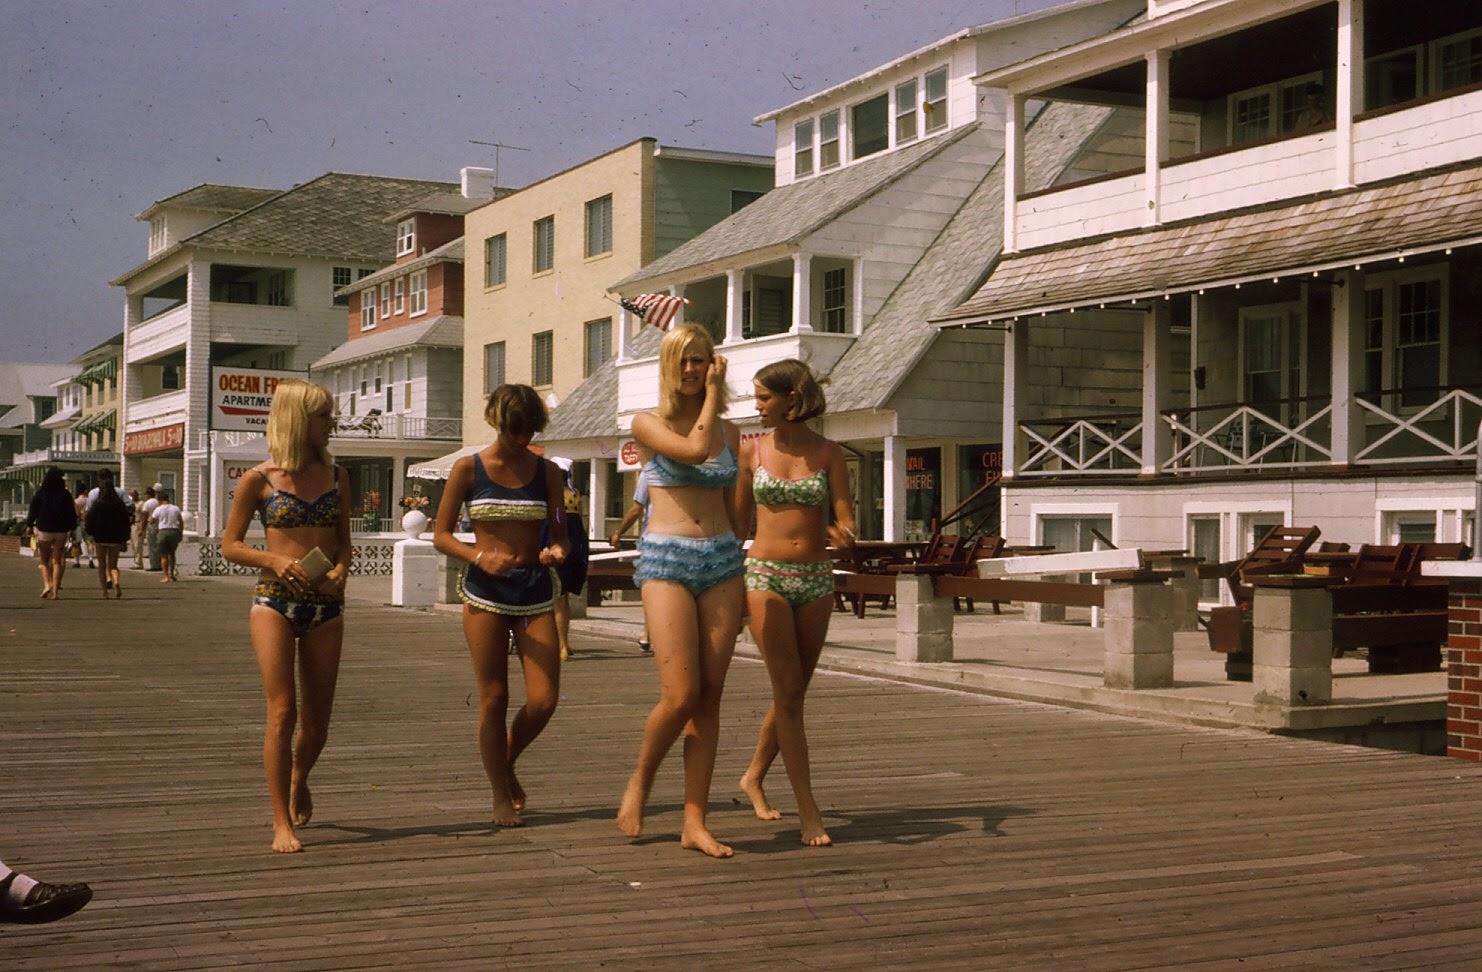 Nude beach girls ocean city md